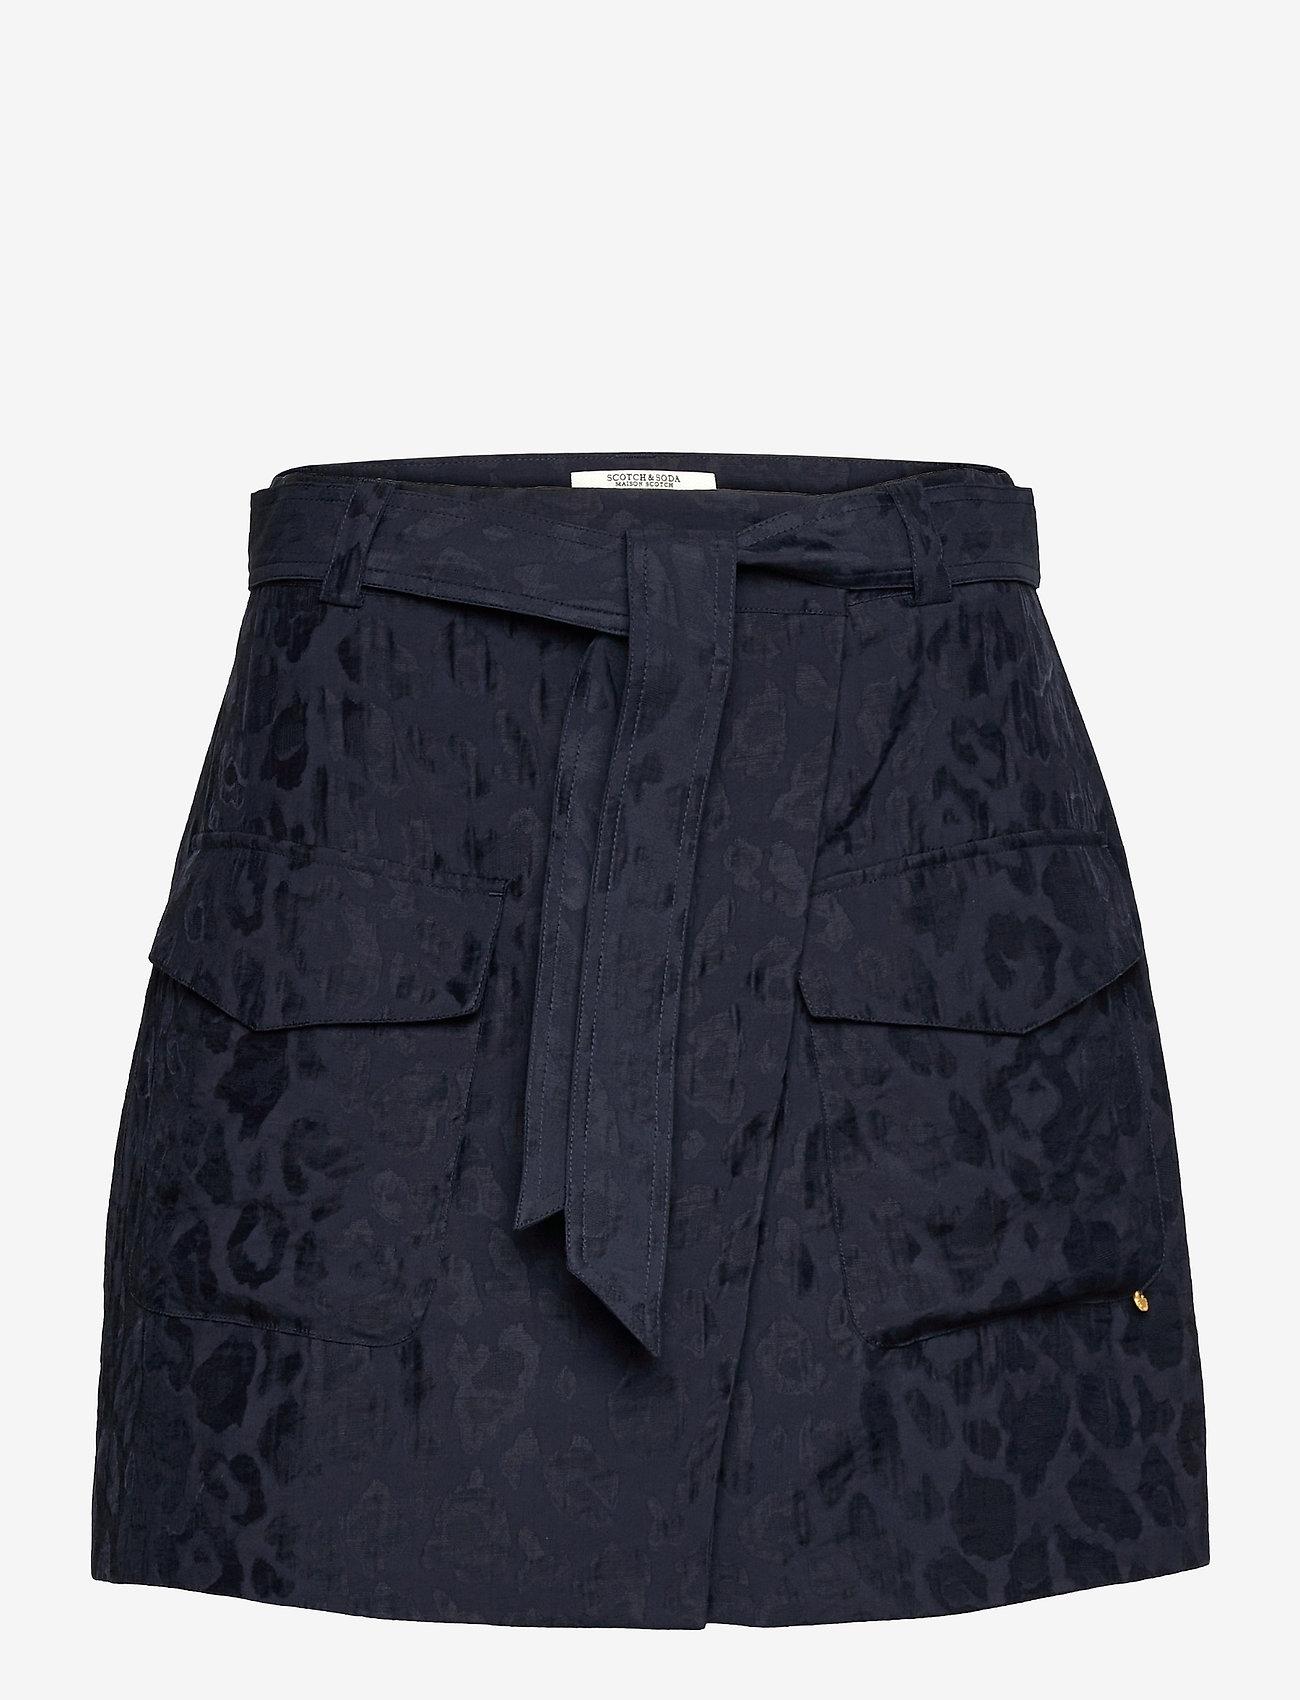 Scotch & Soda - Wrap-over skirt in animal jacquard Tencel™ quality - omlottkjolar - night - 0